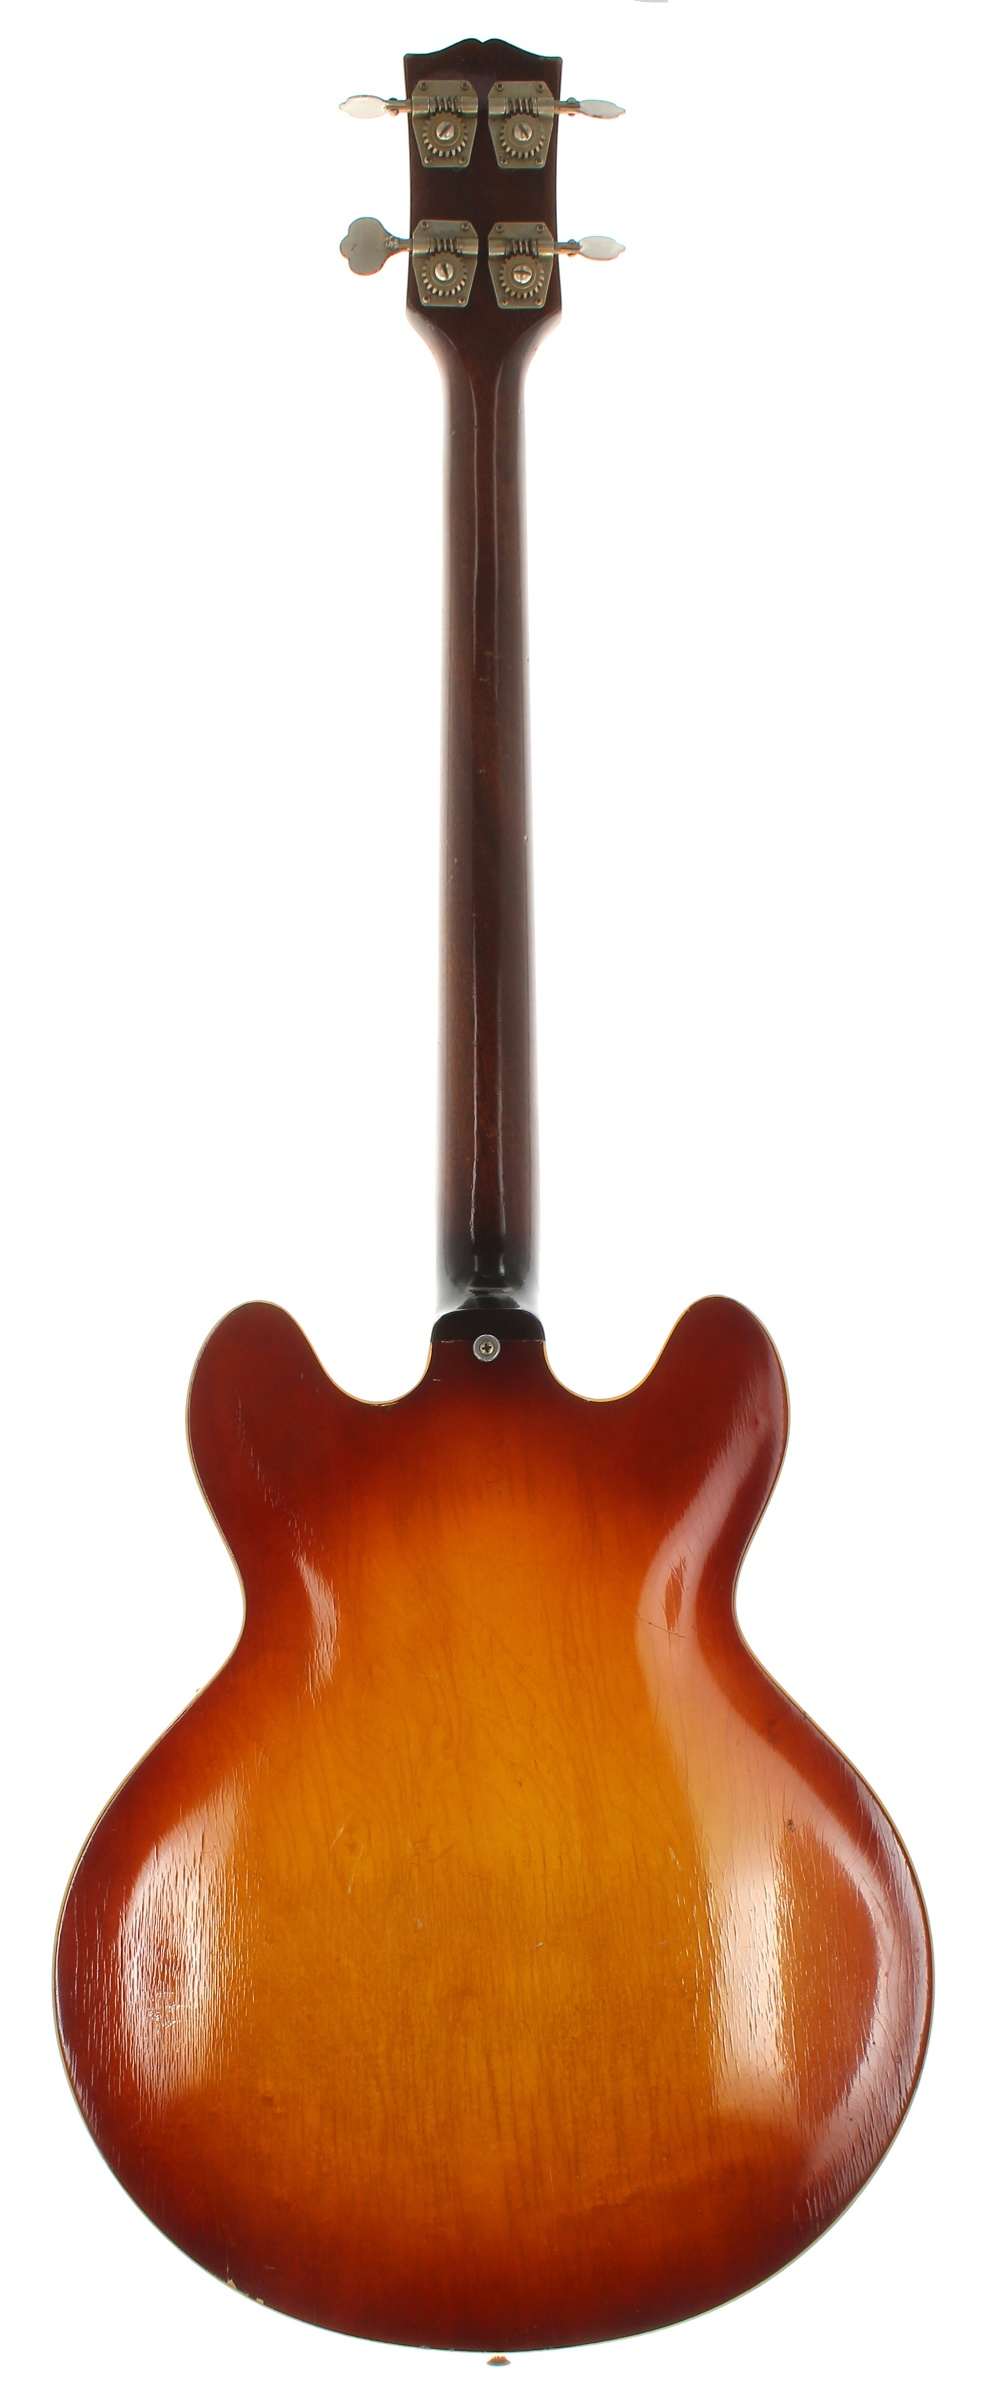 1966 Gibson EB-2 semi-hollow body bass guitar, made in USA, ser. no. 4xxxx6; Finish: sunburst, - Image 2 of 2